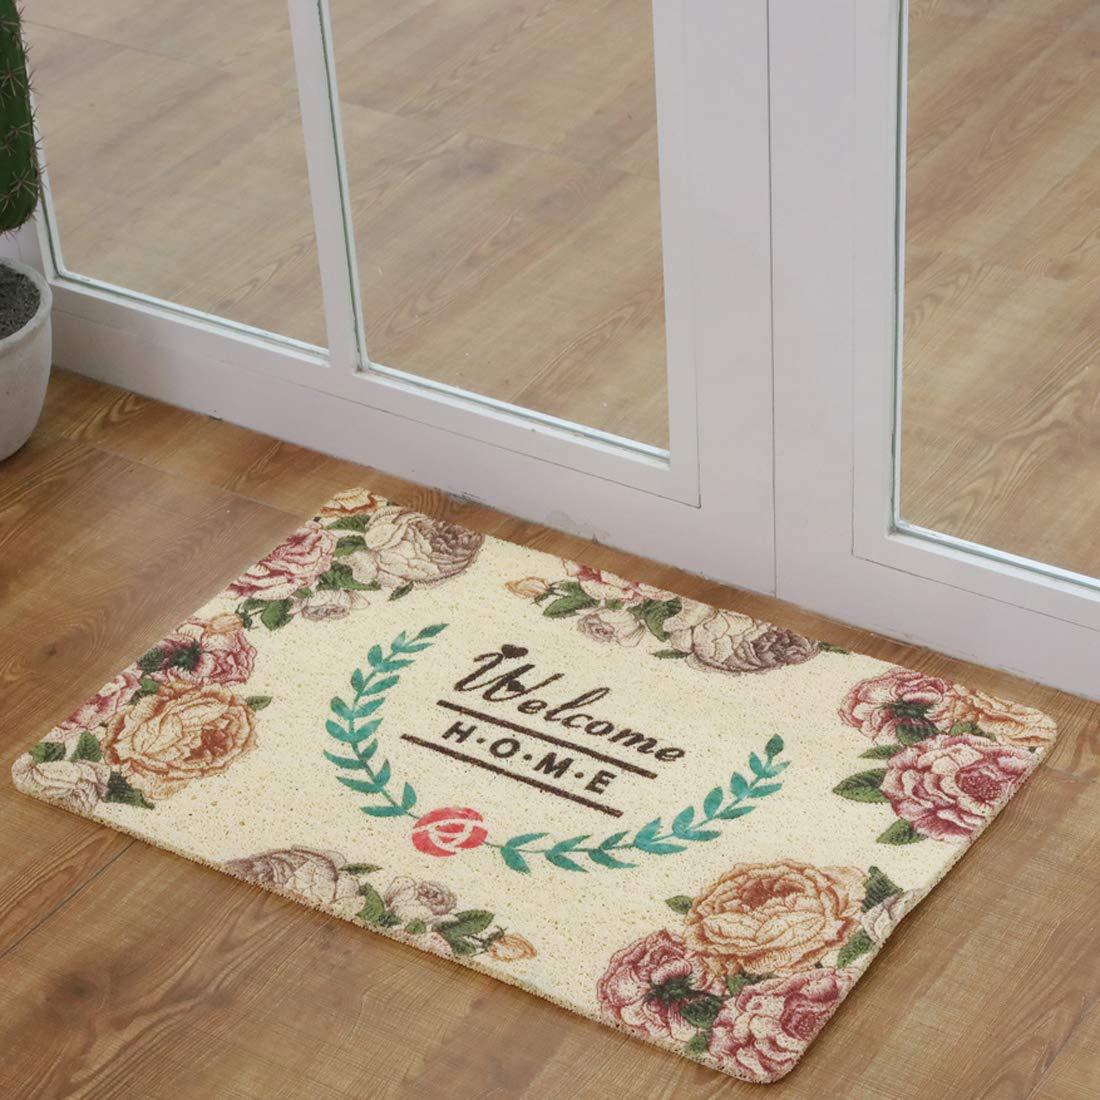 Dream Catcher,Indoor Entrance,Rubber,Non Slip Rug Waterproof for Home Decor 15.8 X 23.6